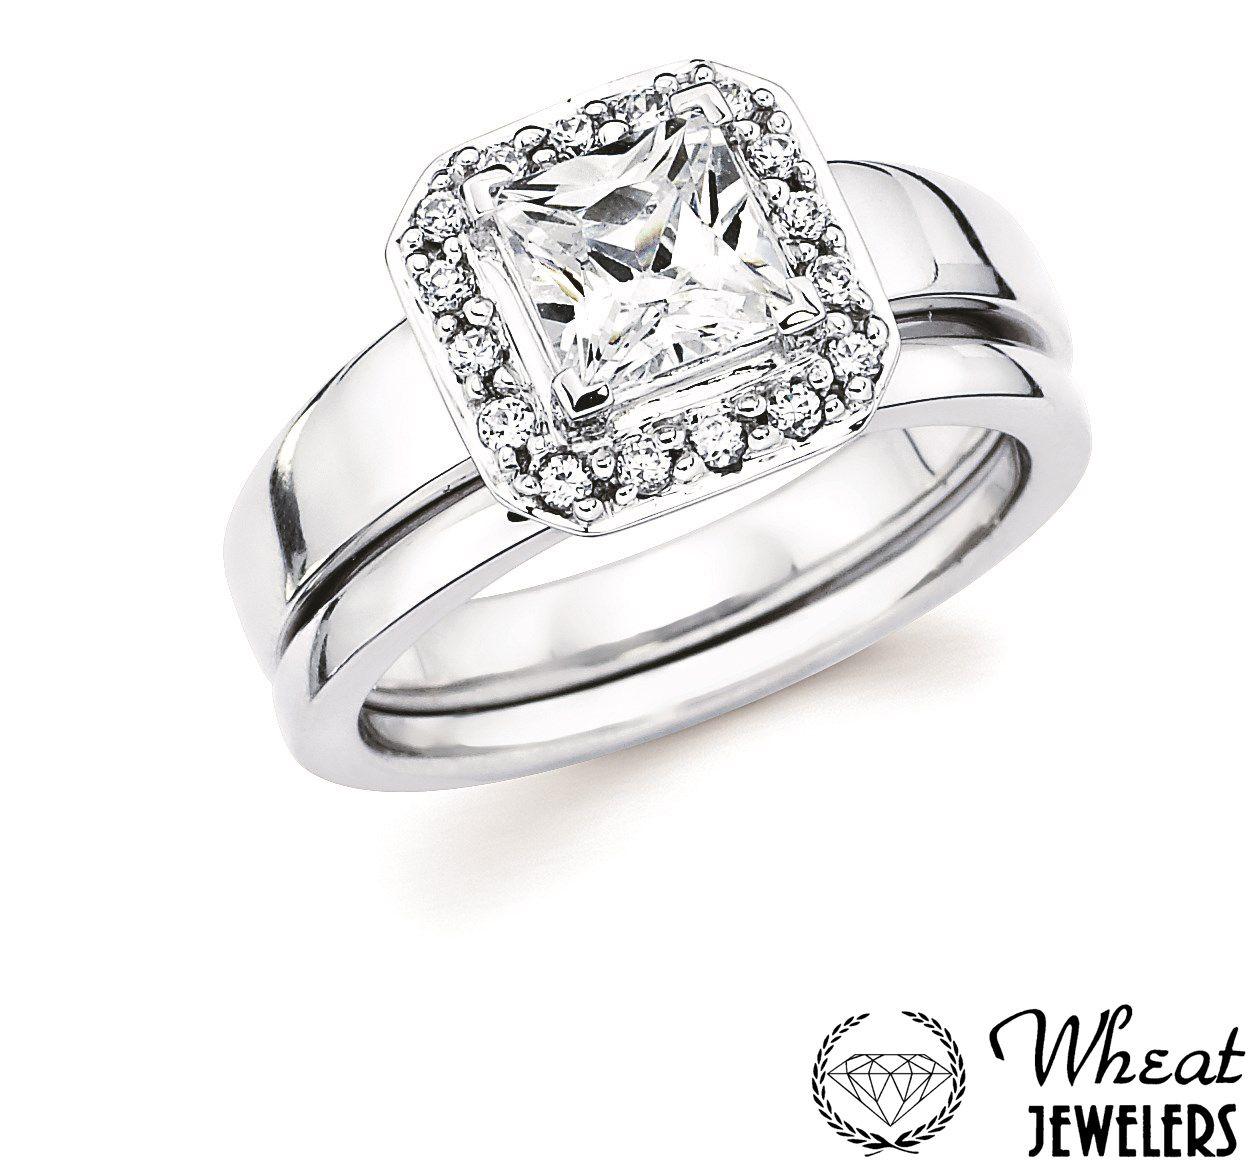 Square Halo Engagement Ring With Plain Shank And Matching Wedding Band # Engagementring #weddingband #